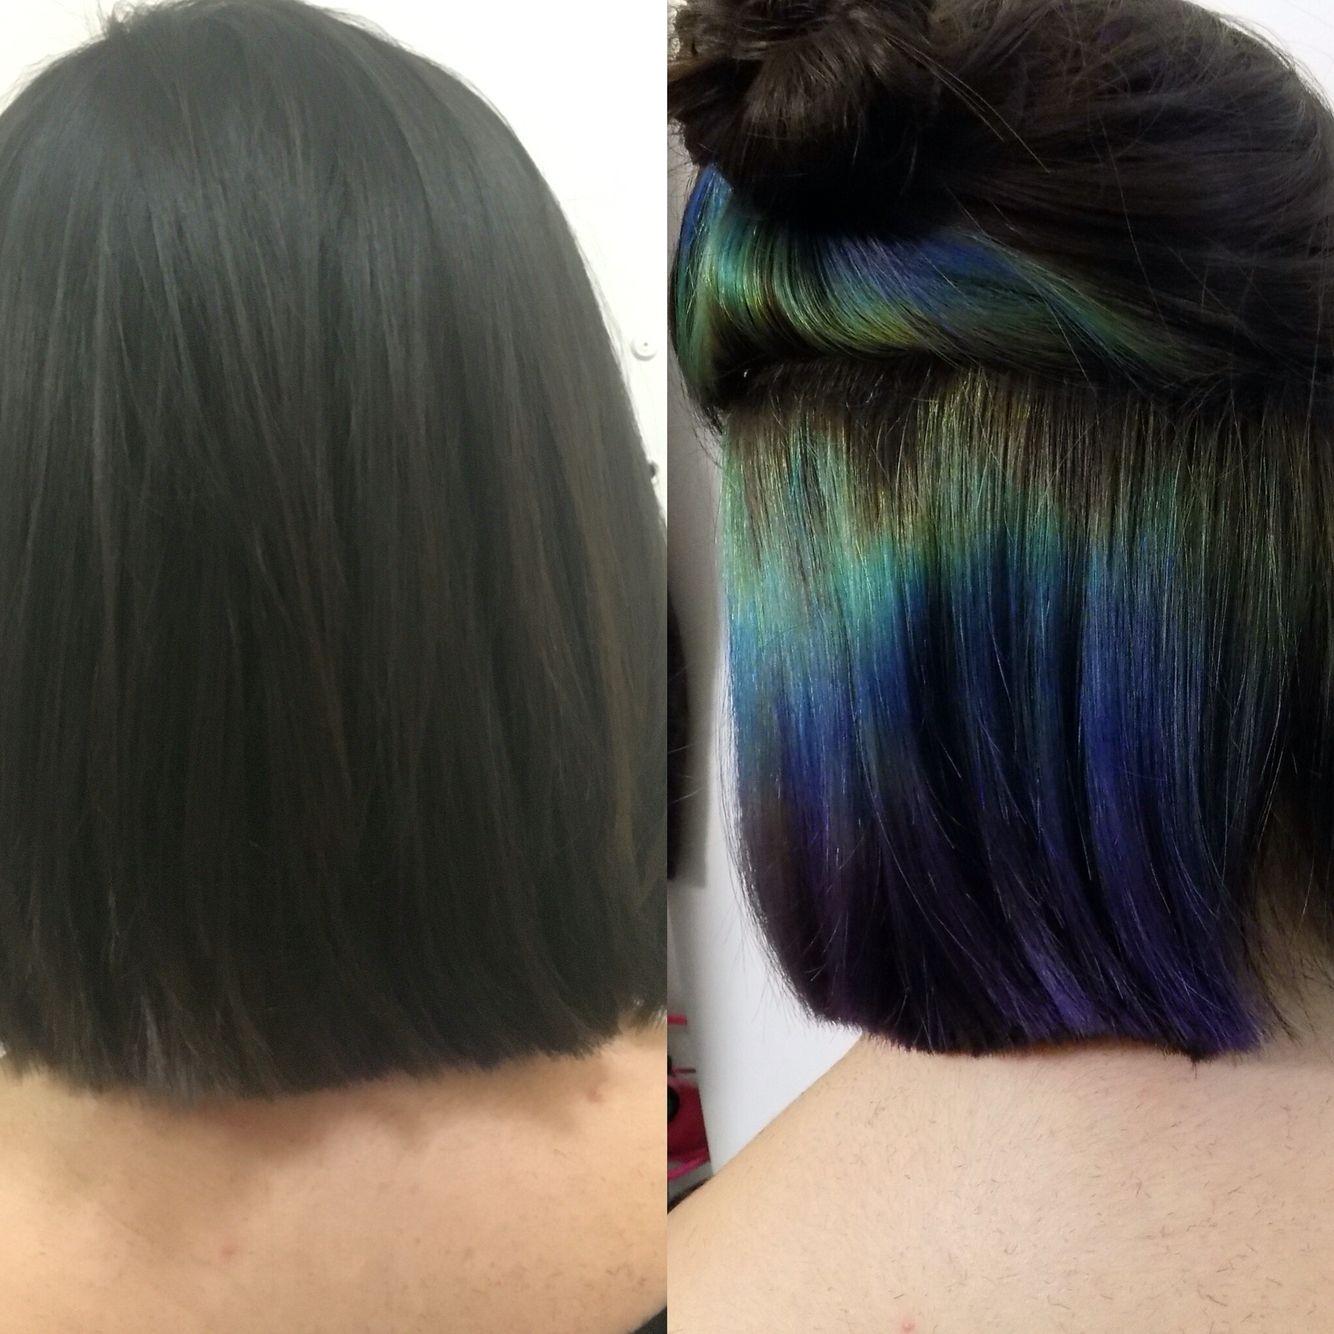 Peacock peekaboo hair